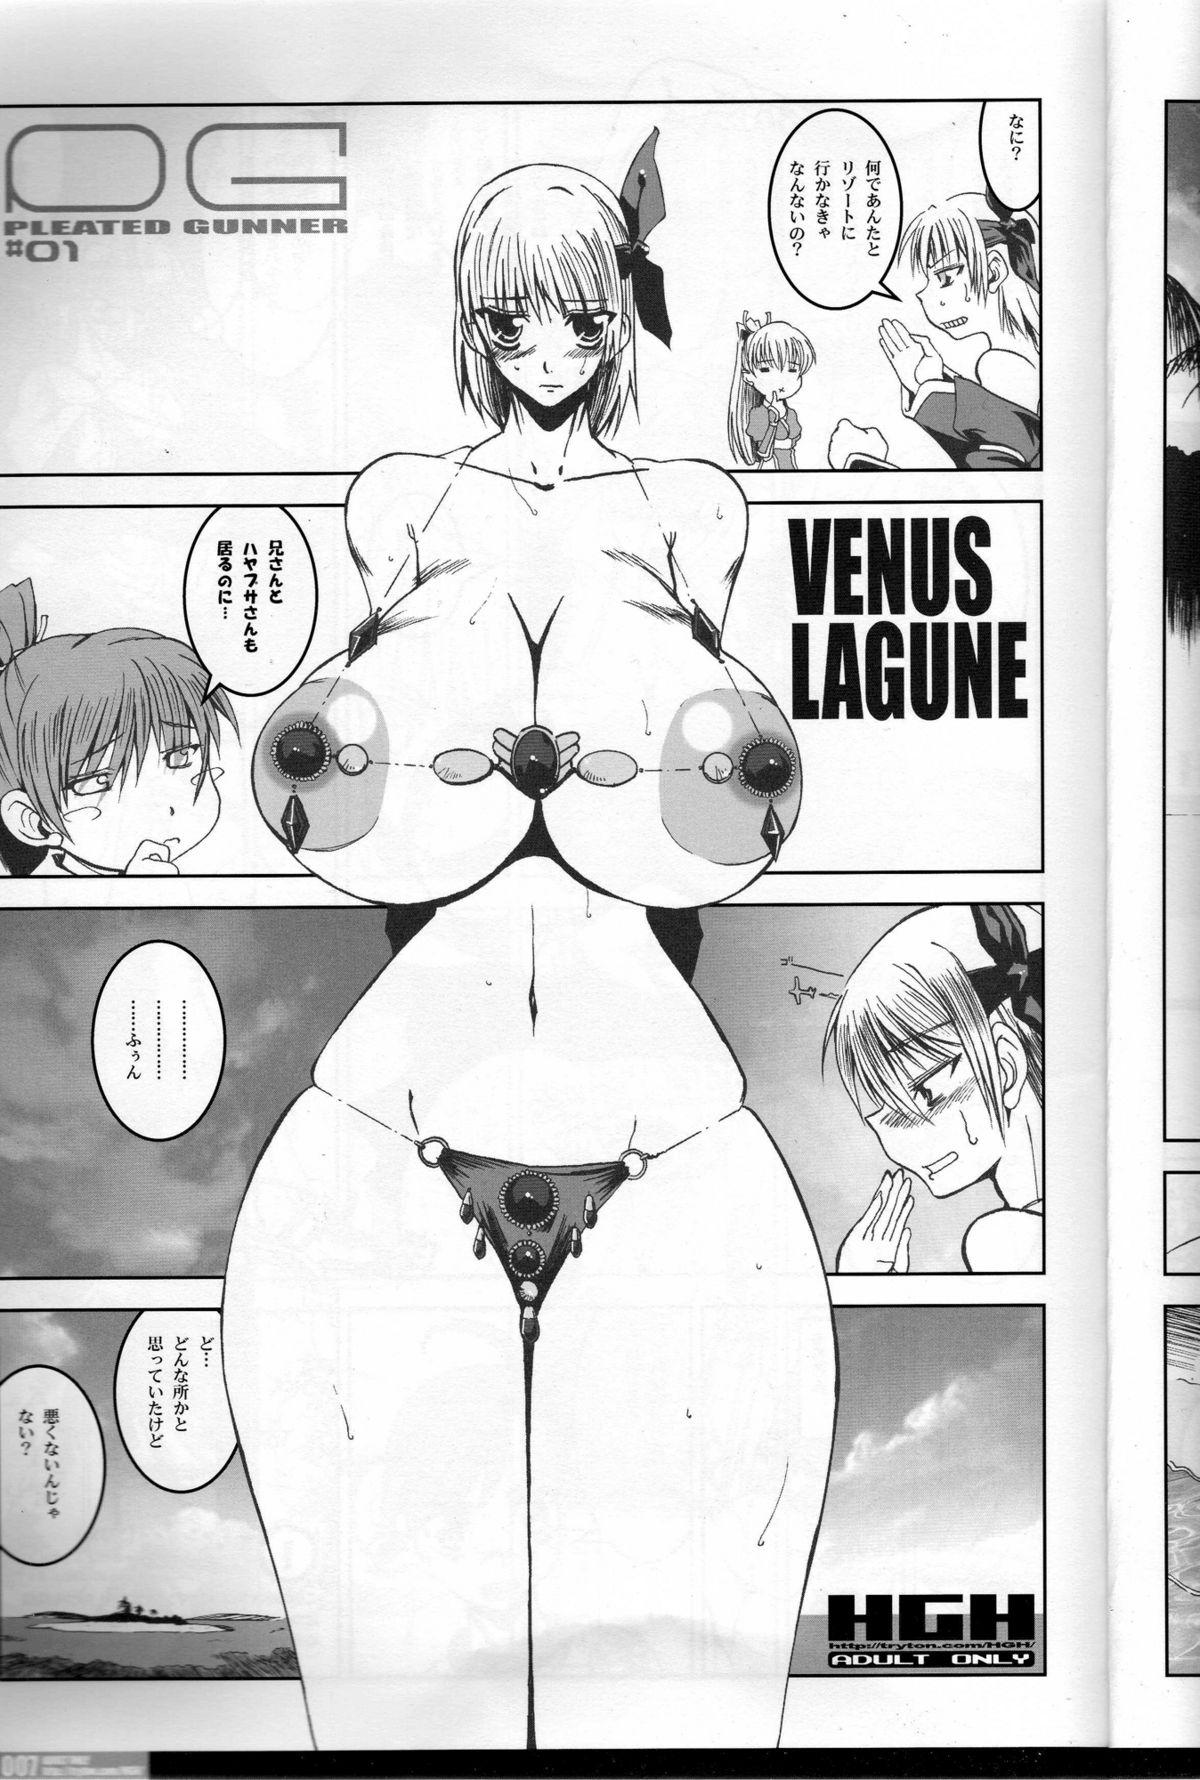 Pleated Gunner #01 - Venus Lagune 4